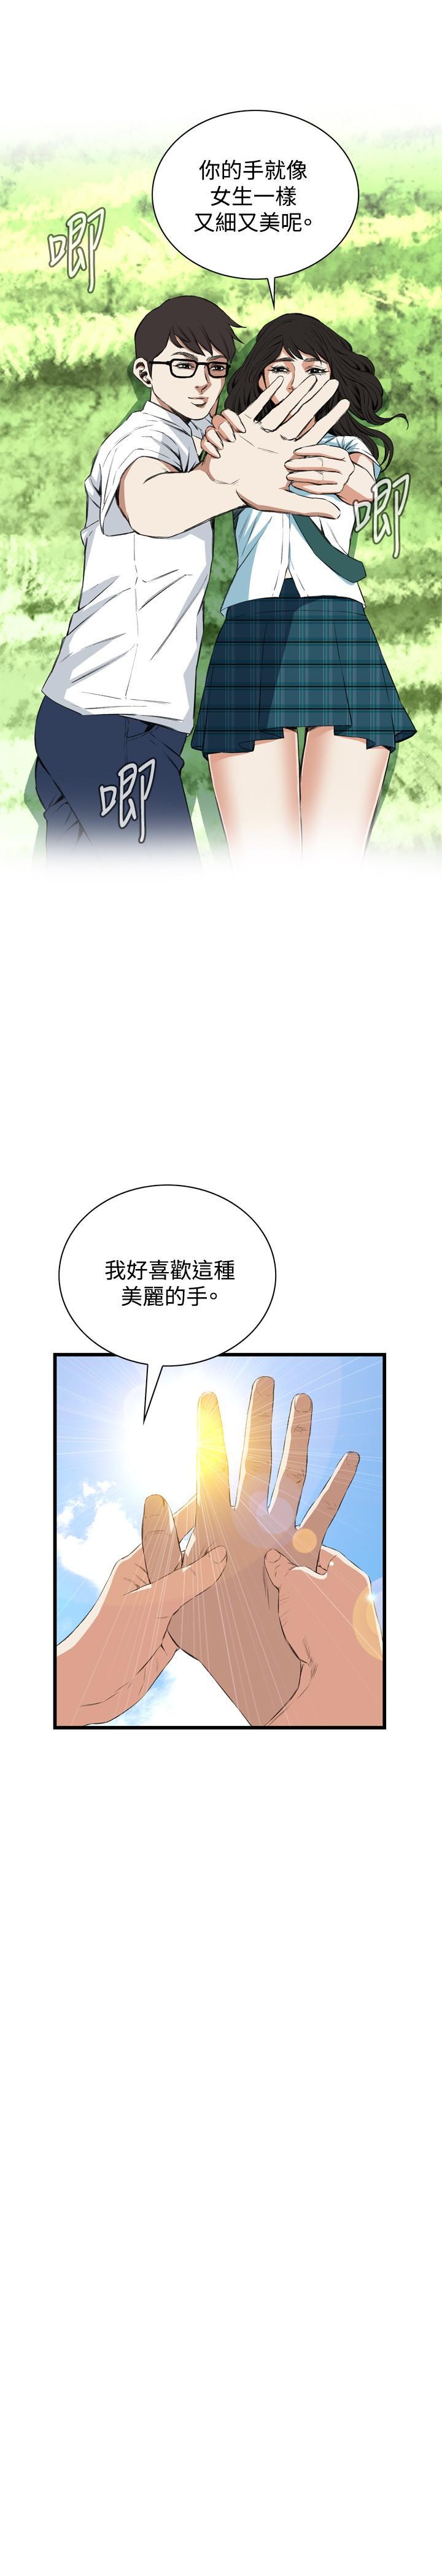 Take a Peek 偷窥 Ch.39~55 [Chinese]中文 443